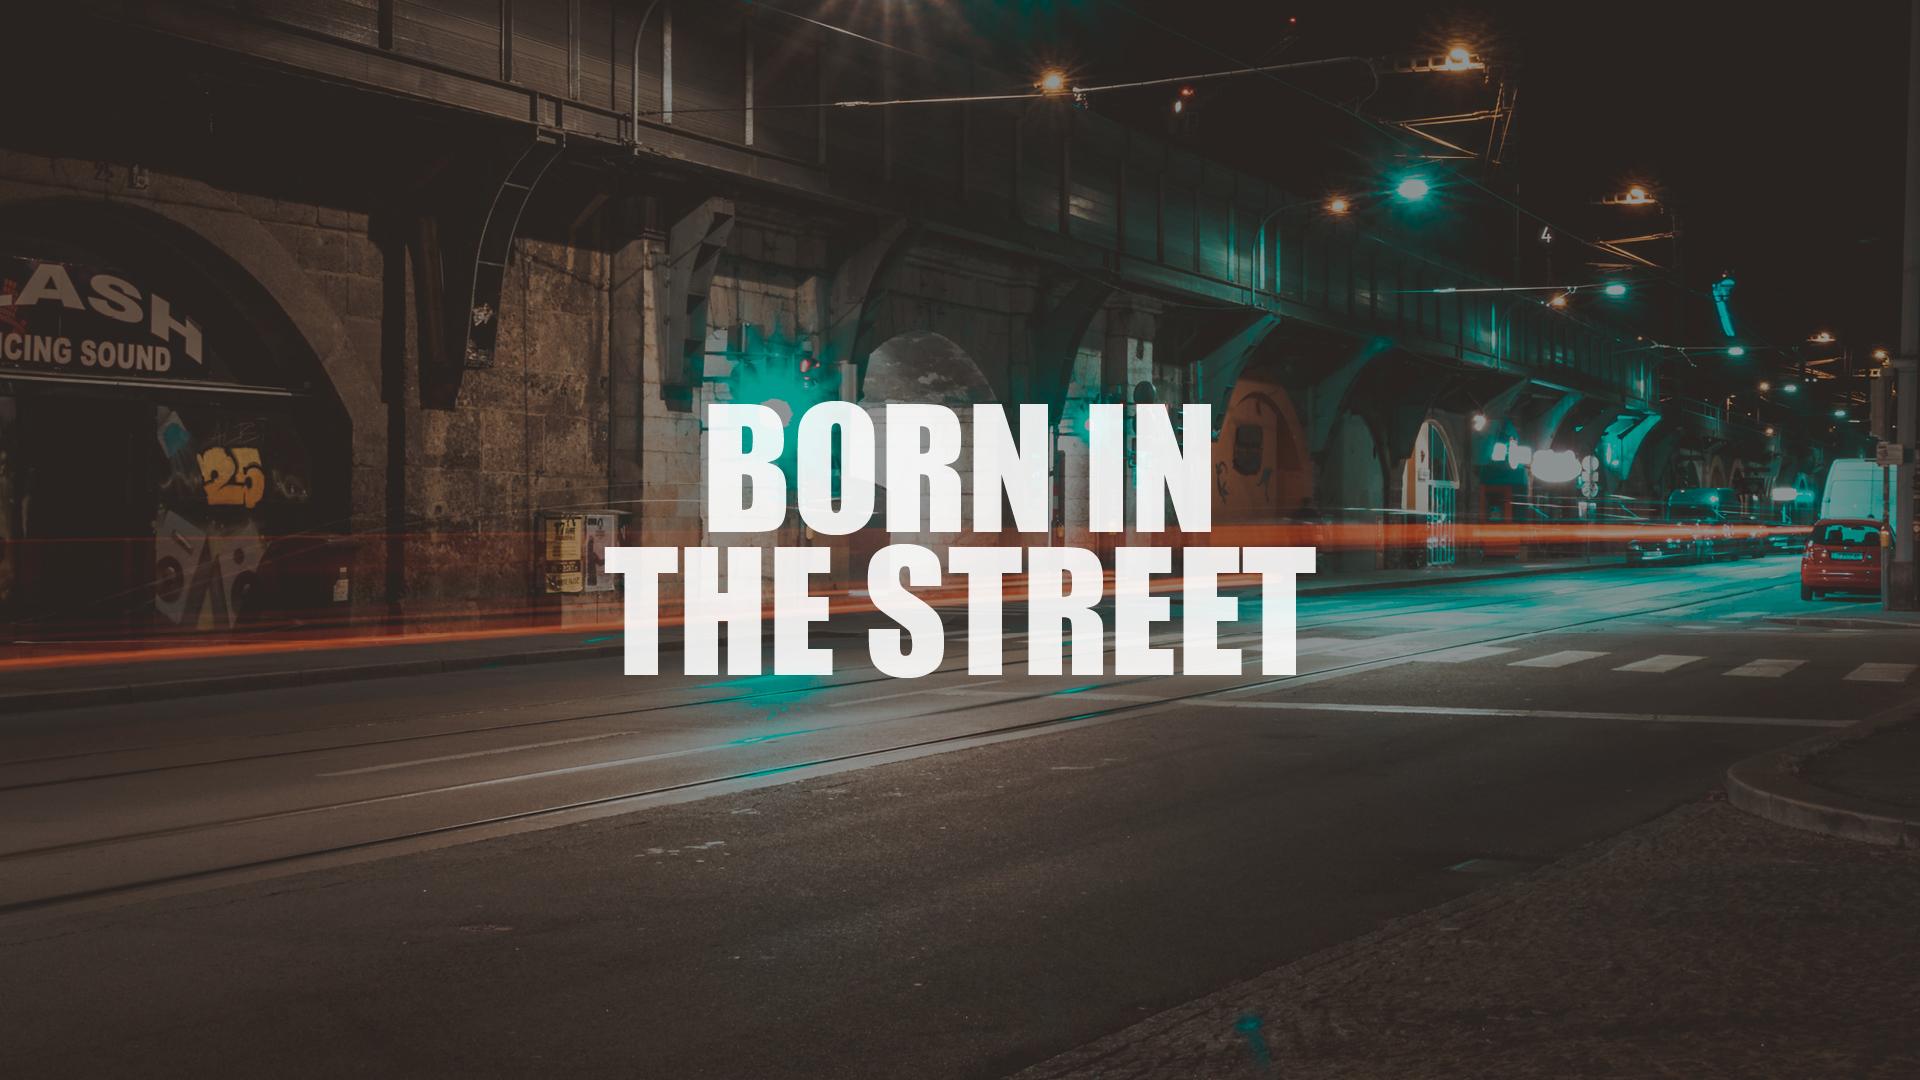 Born in the street [OV]